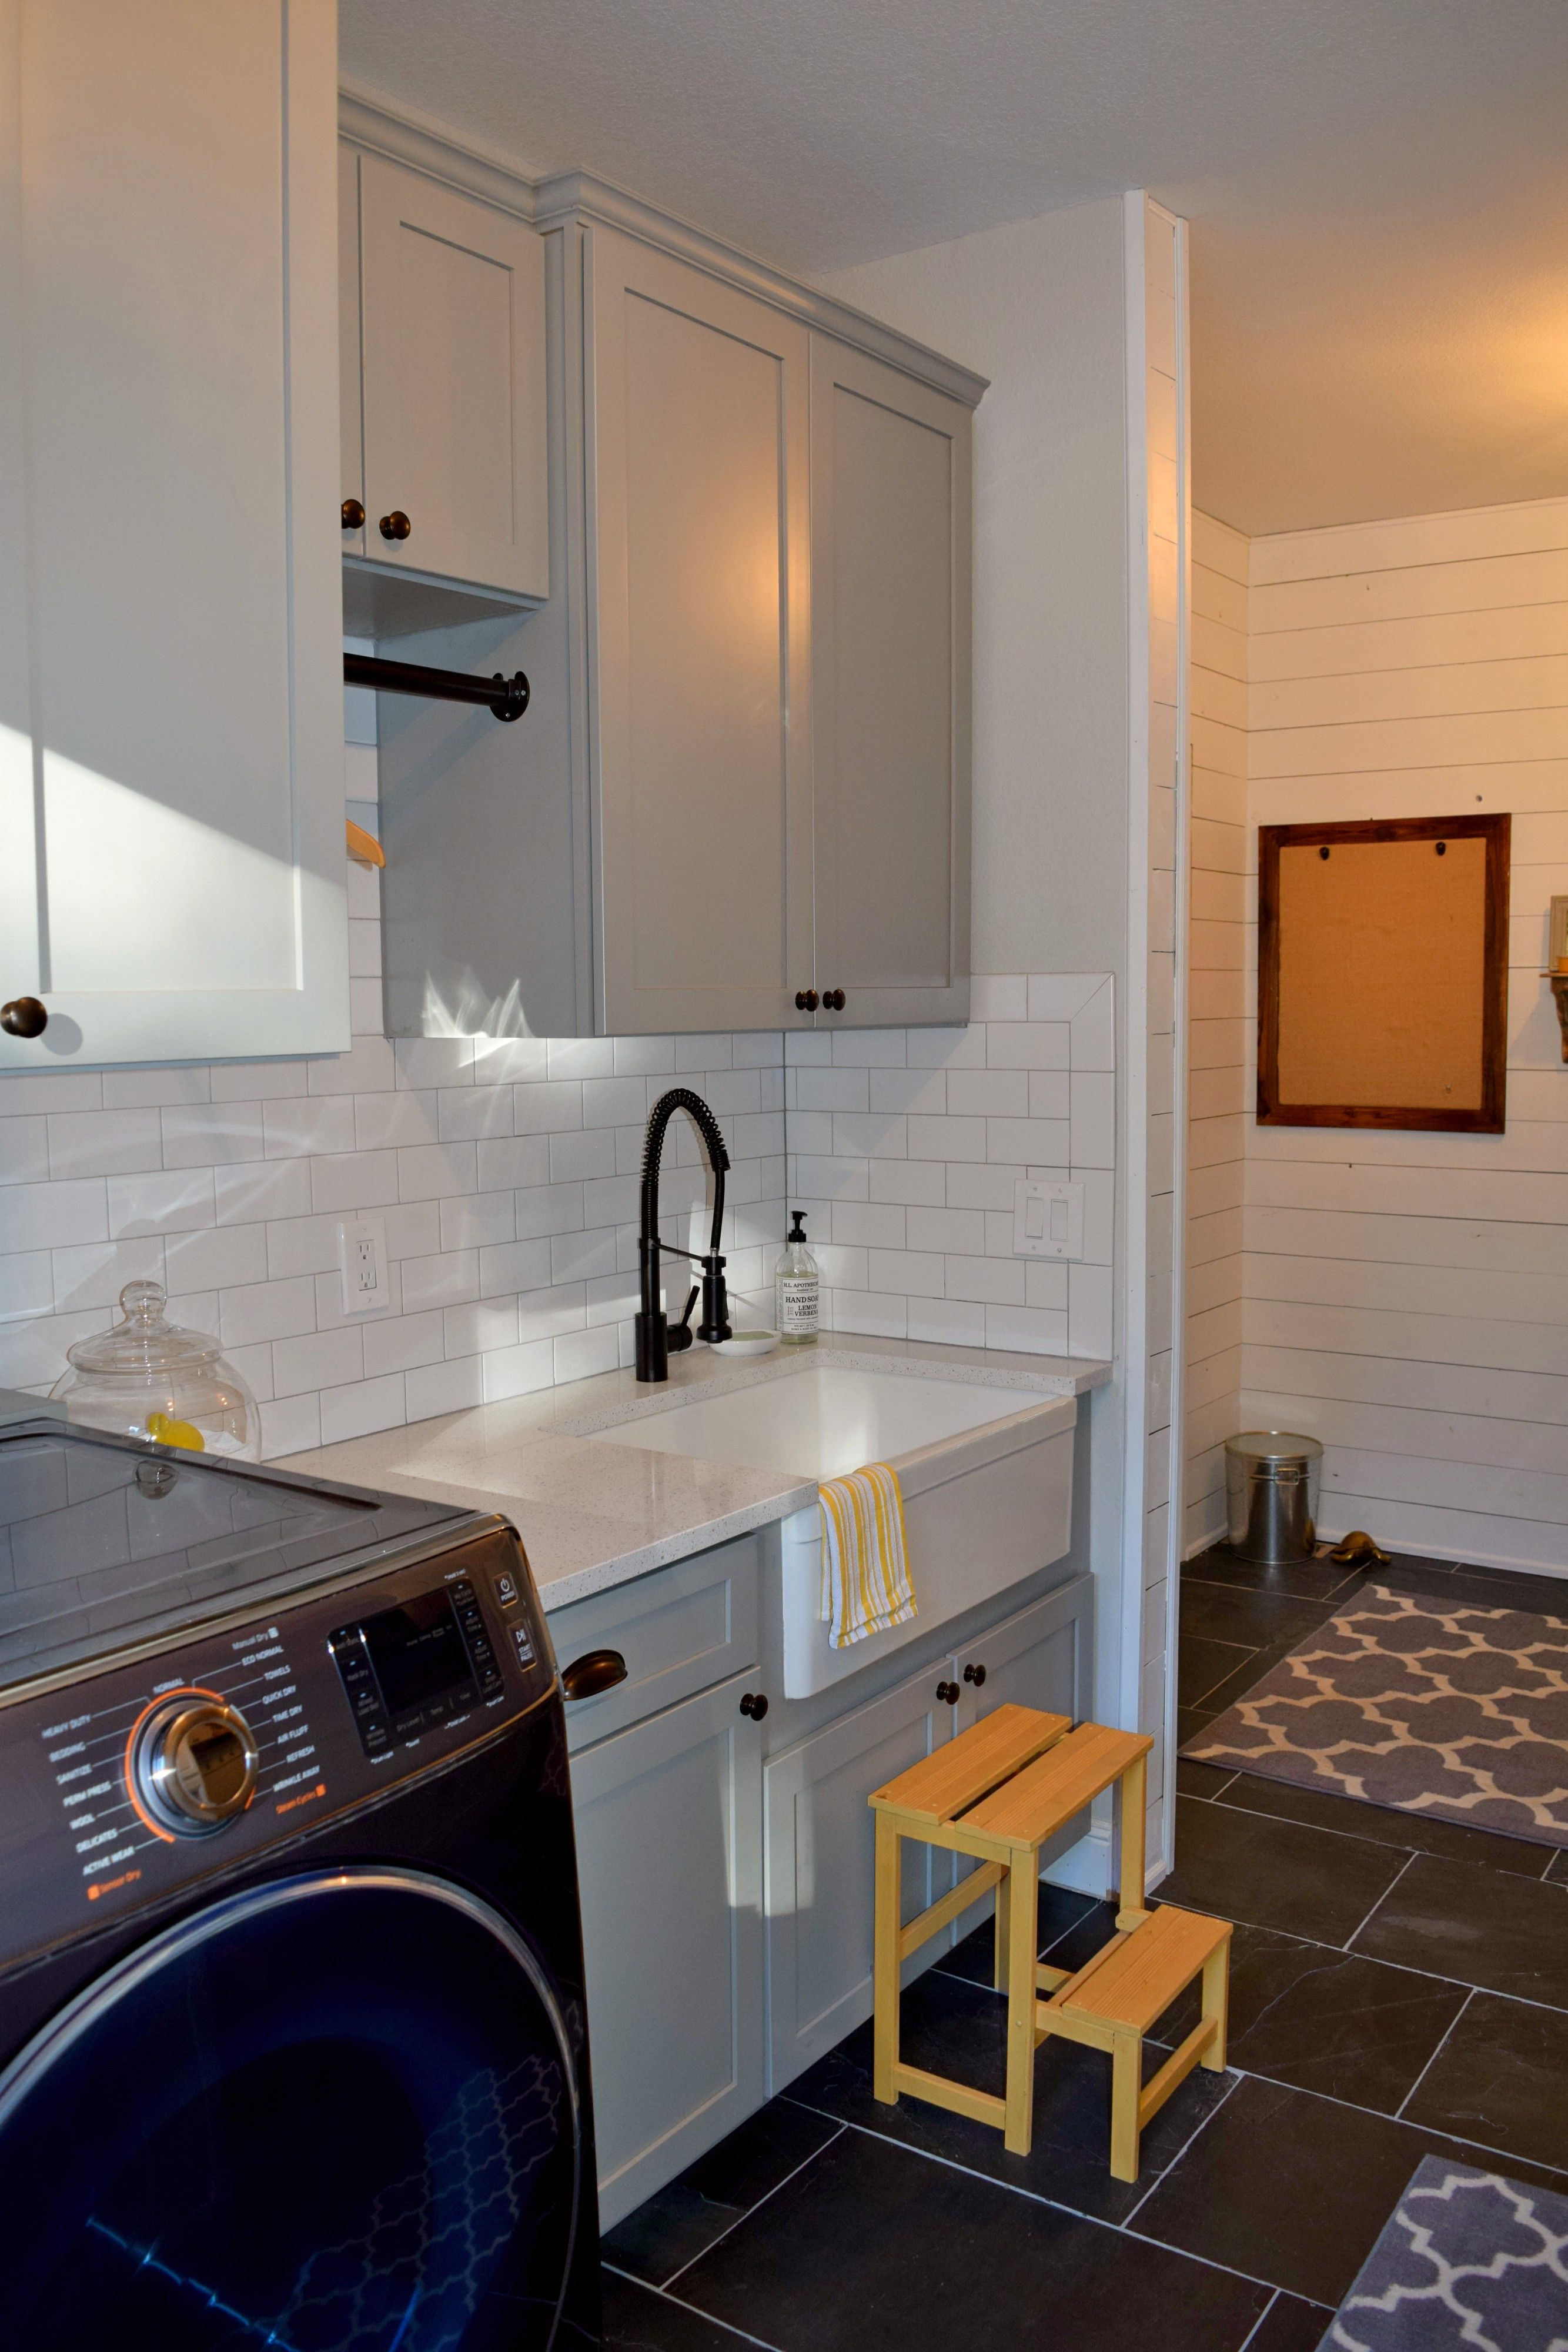 BKC Kitchen And Bath Denver Laundry Room Cabinets   Medallion Cabinetry,  Lancaster Door Style, Harbor Mist Sheer On Maple